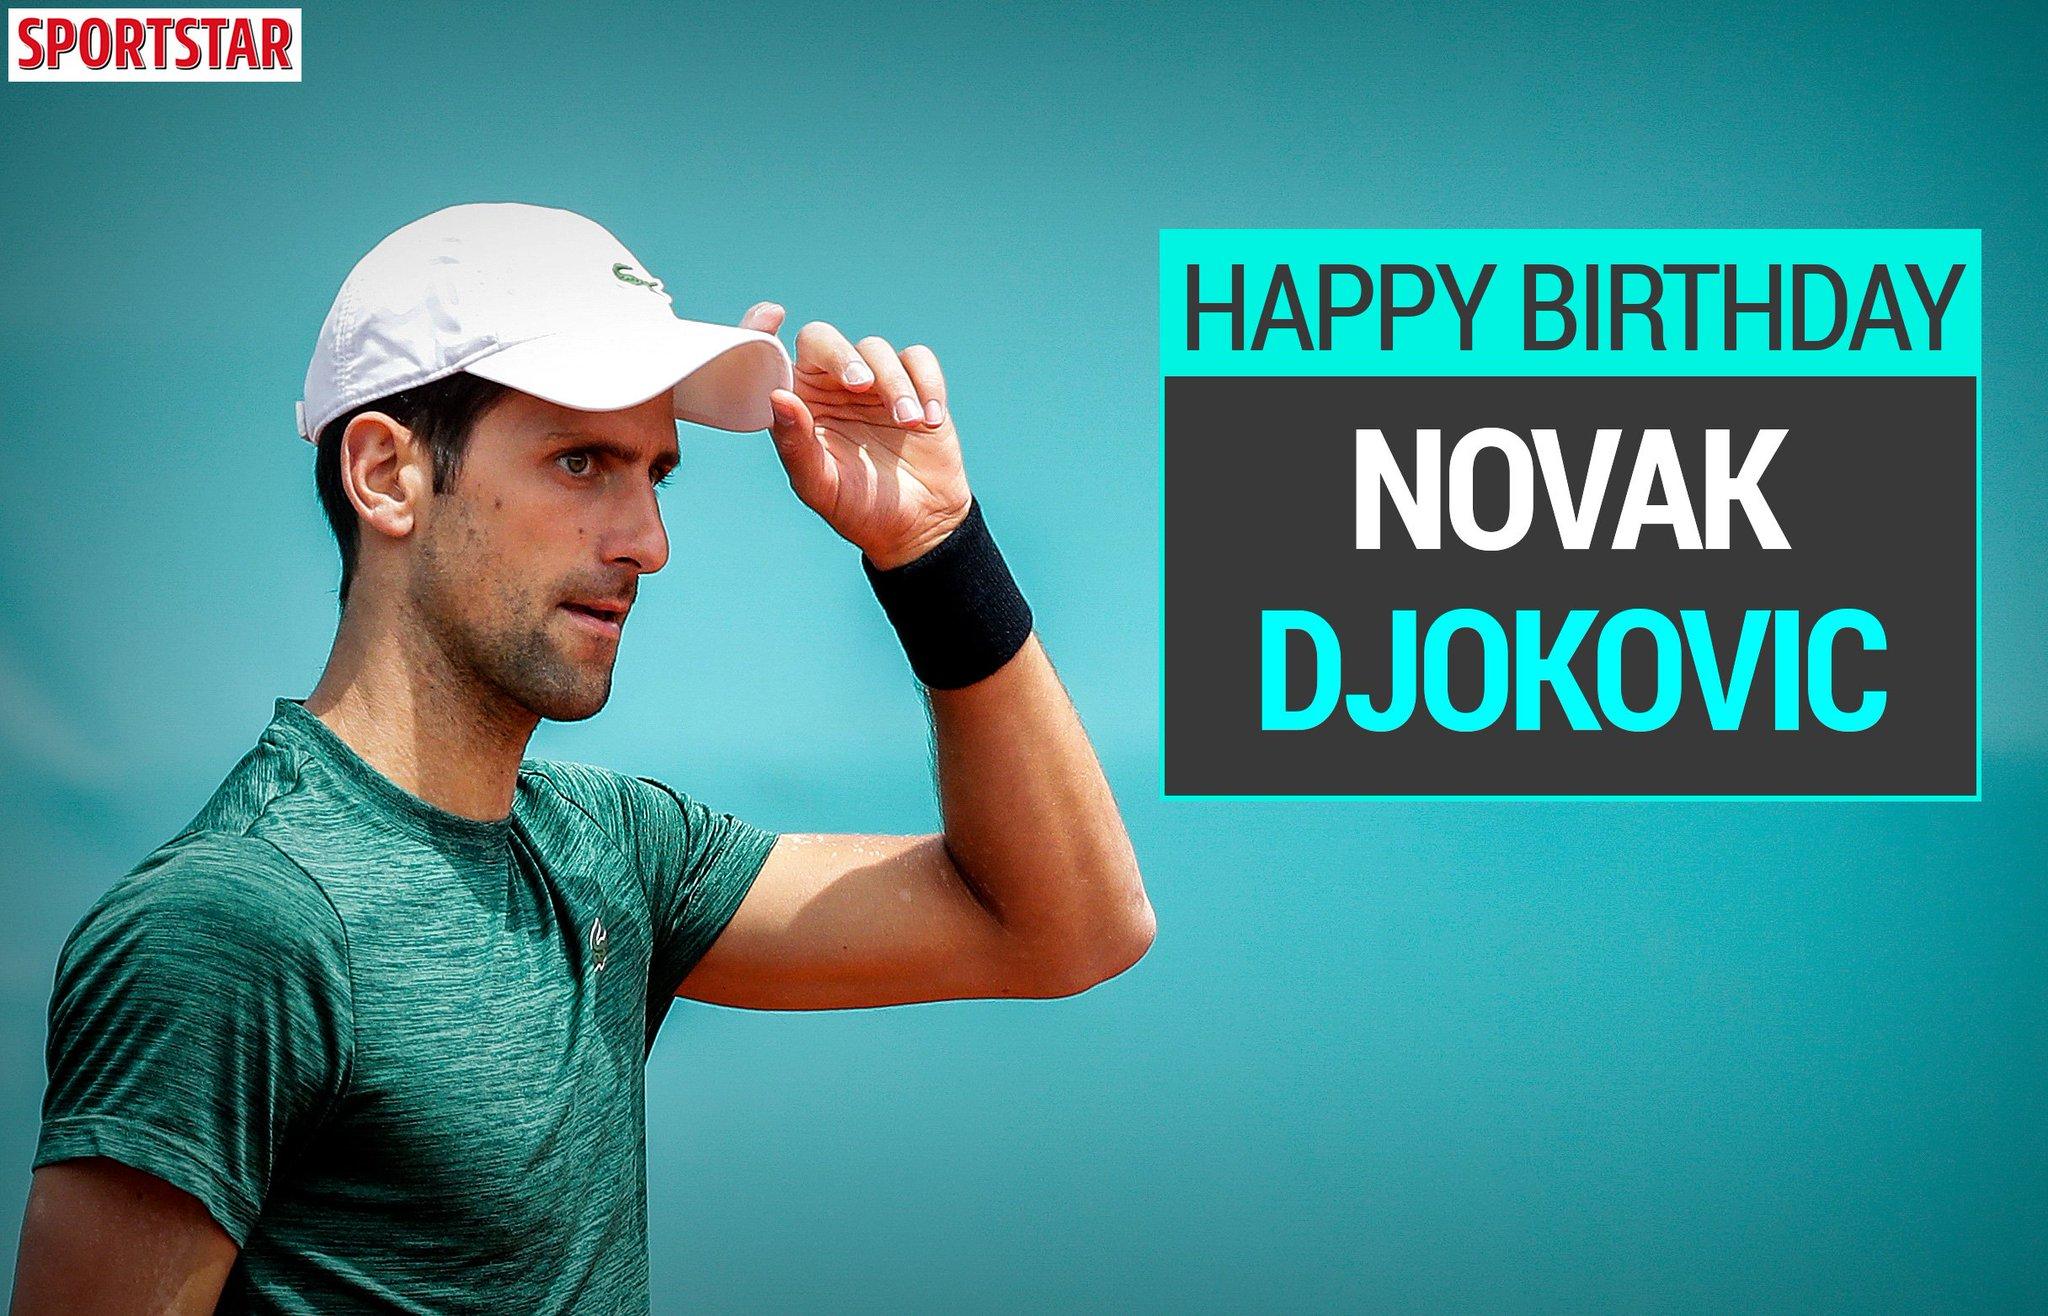 It\s birthday. Here\s wishing Novak Djokovic a happy birthday and a grand (slam) year.